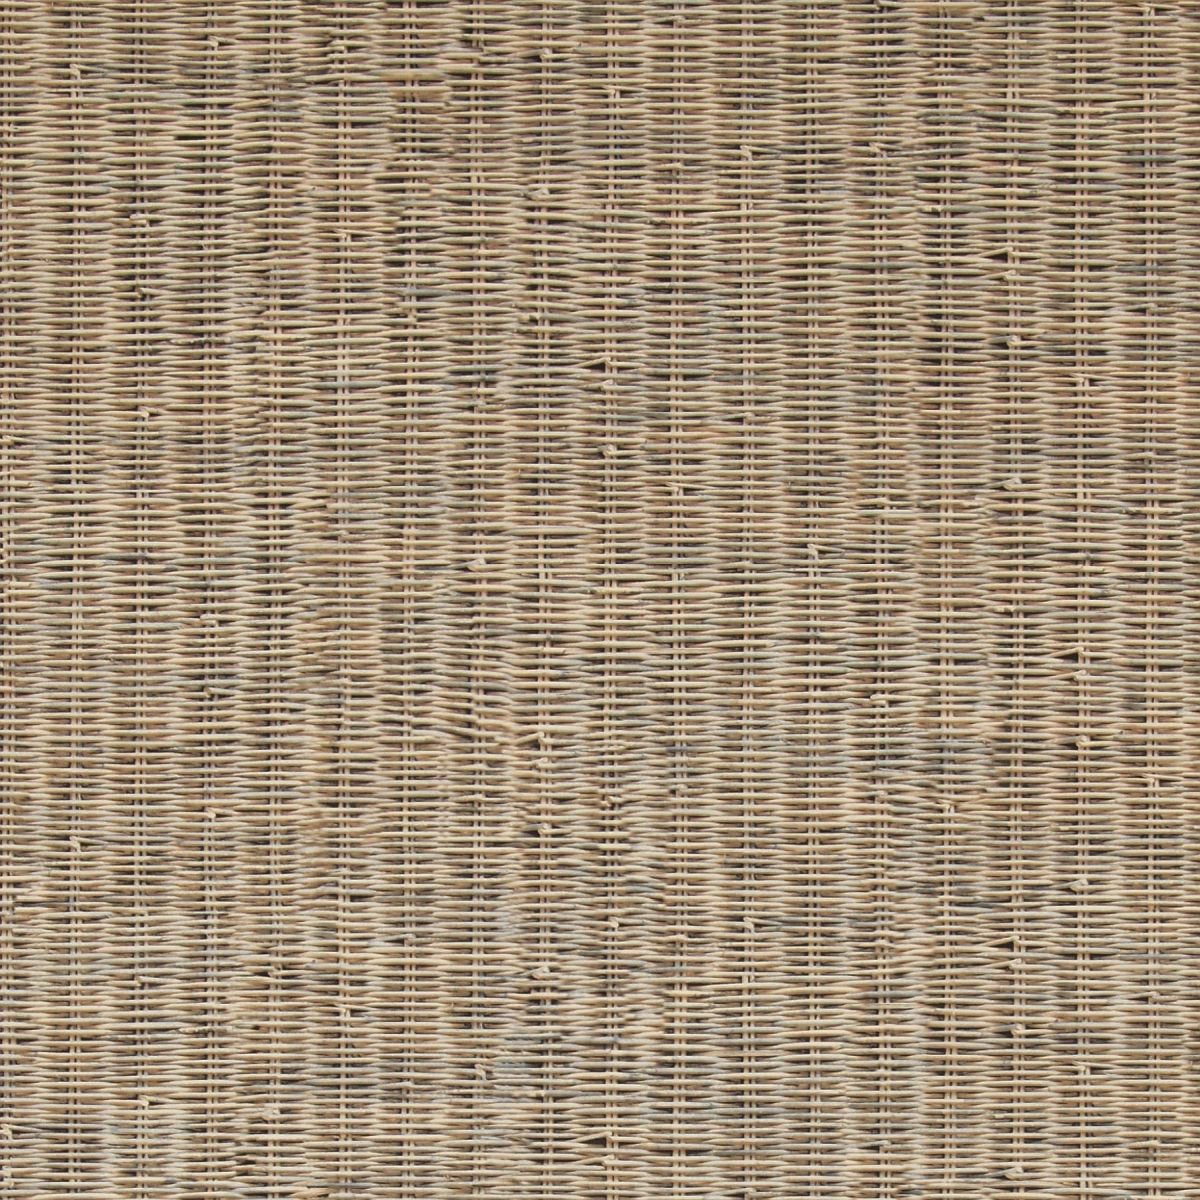 hochwertige tapeten und stoffe b n wallcoverings vliestapete riviera maison 18330 decowunder. Black Bedroom Furniture Sets. Home Design Ideas